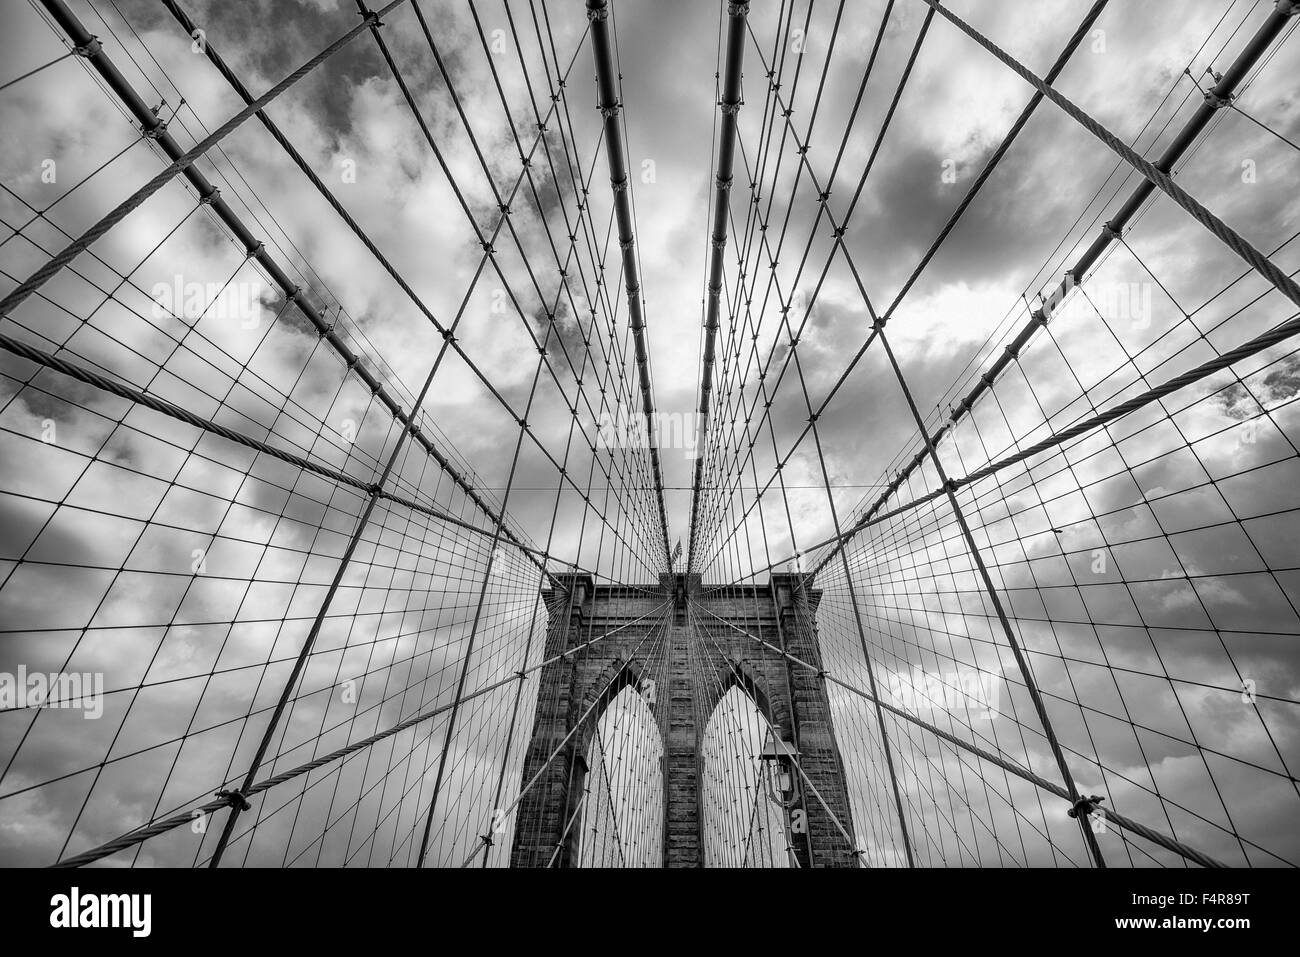 Close up view of the Brooklyn Bridge, New York USA - Stock Image